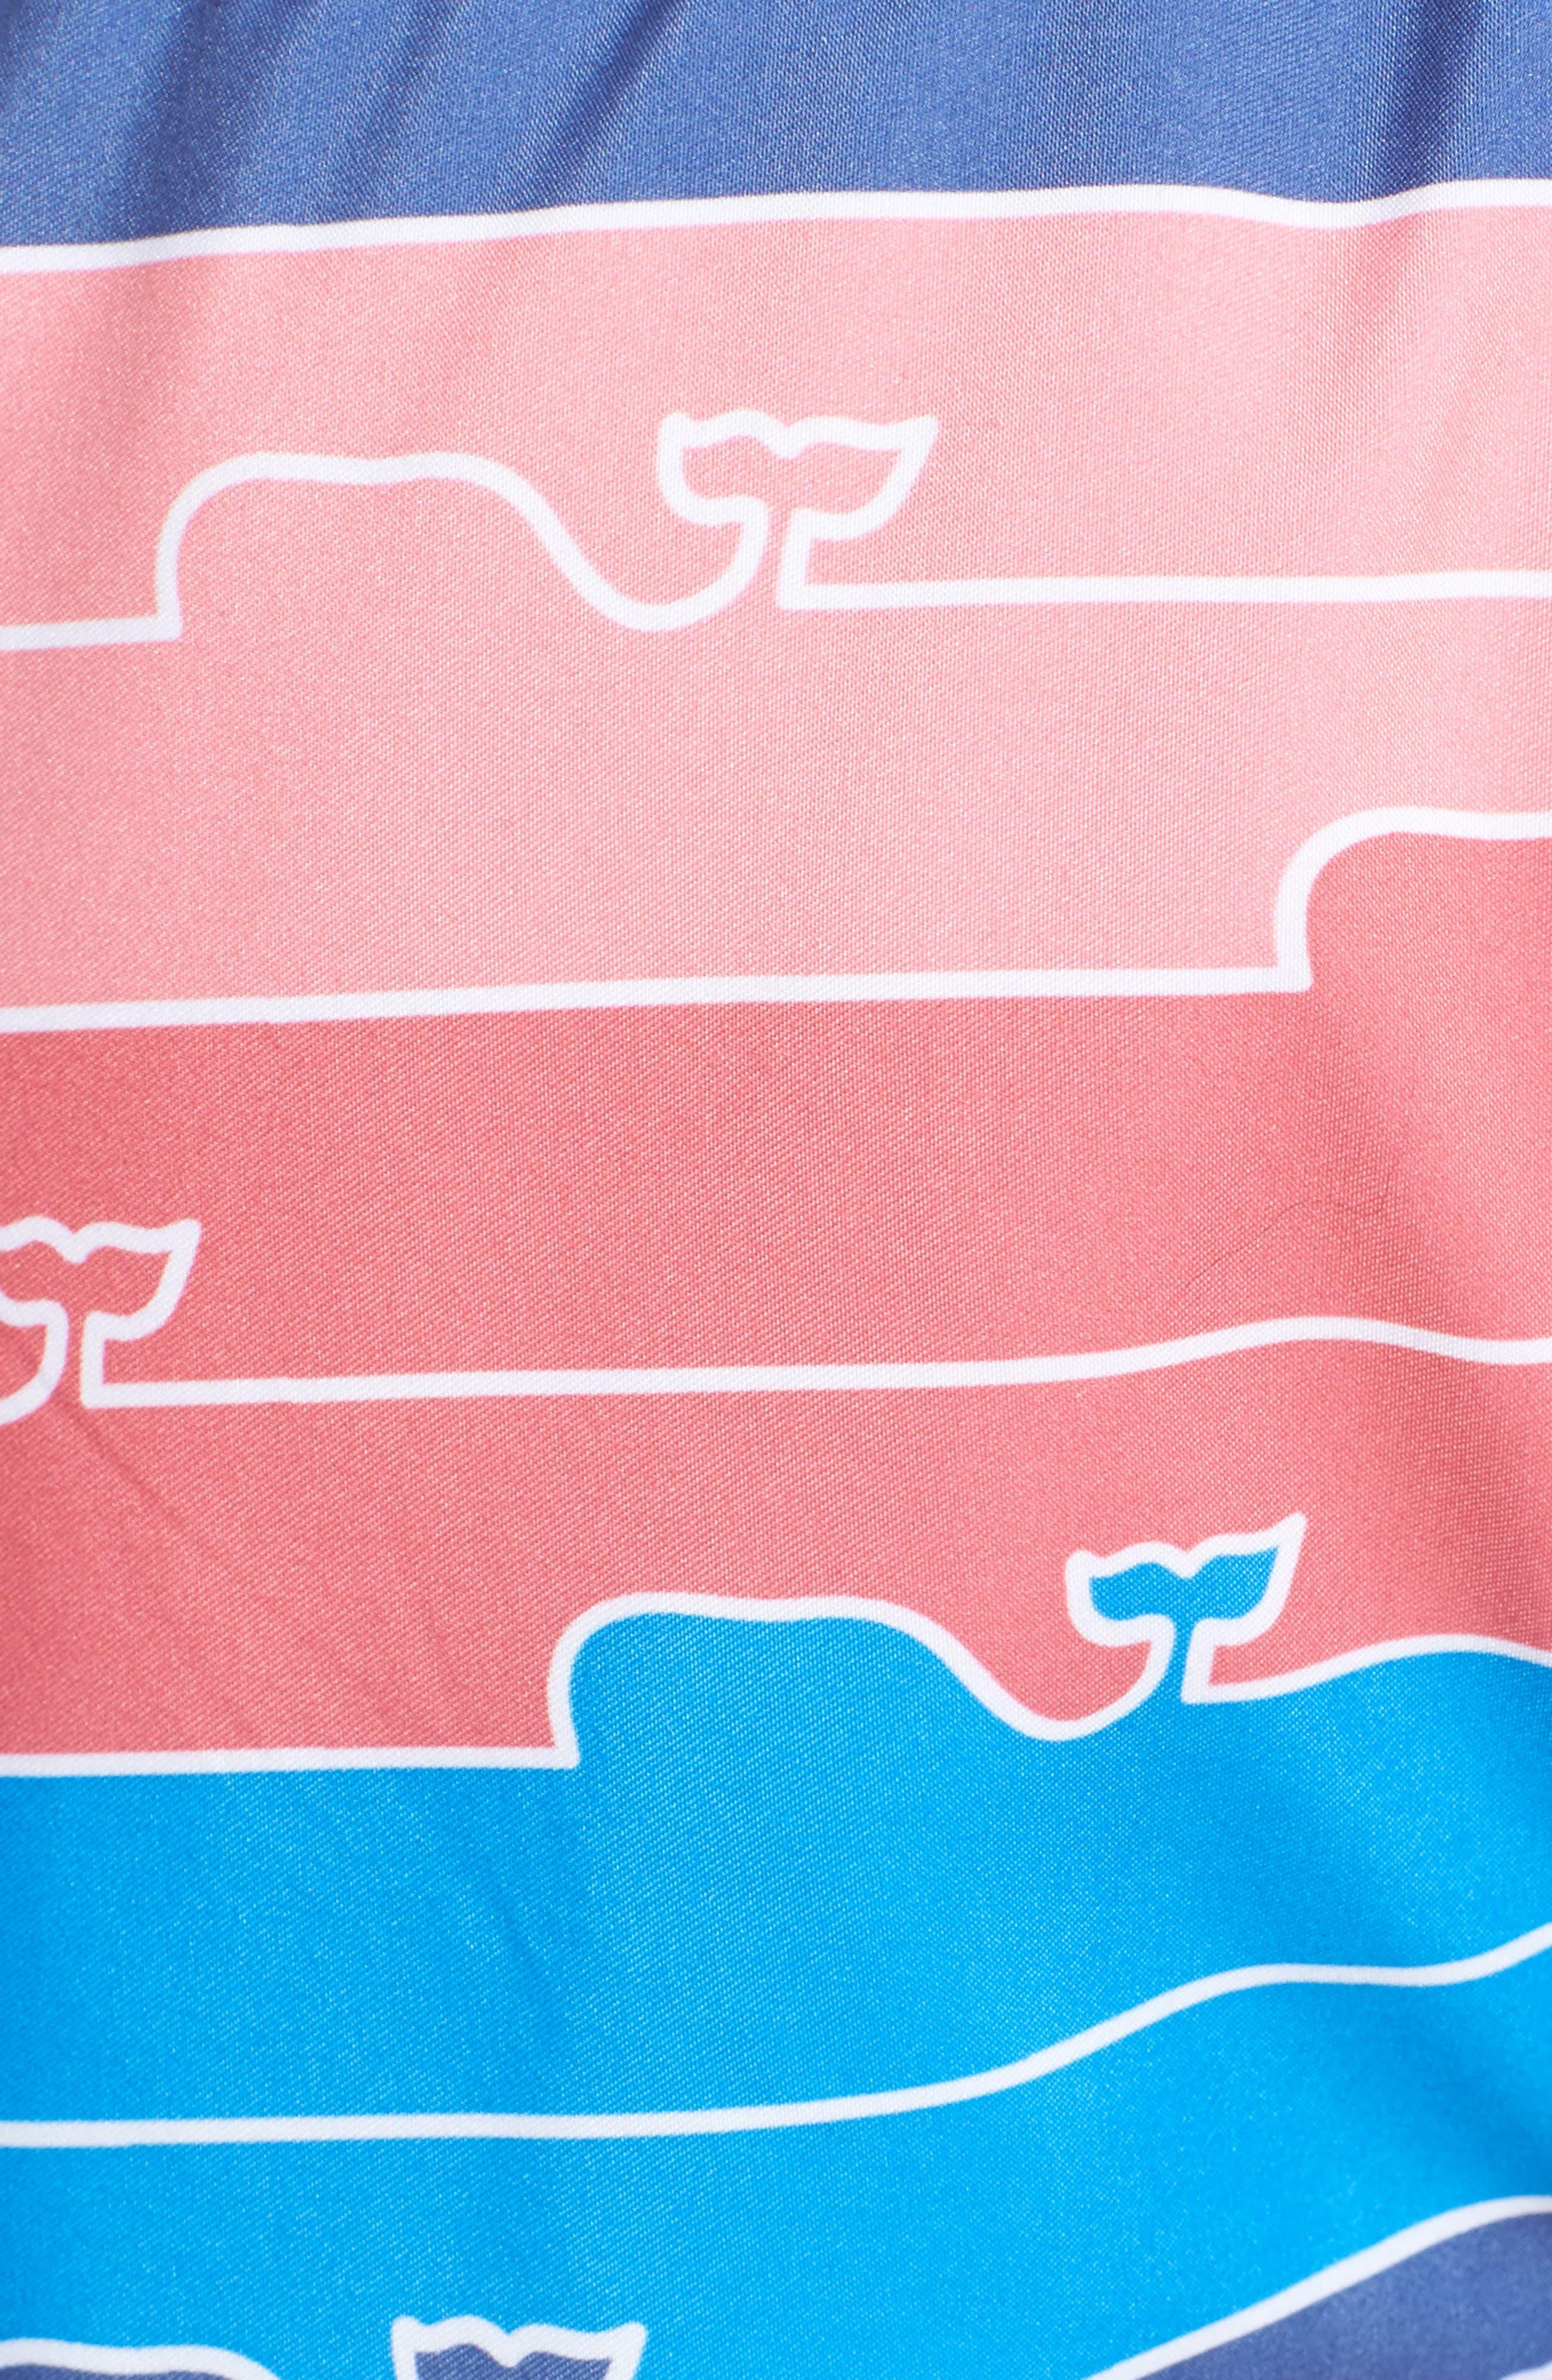 Chappy Whaleline Swim Trunks,                             Alternate thumbnail 5, color,                             461